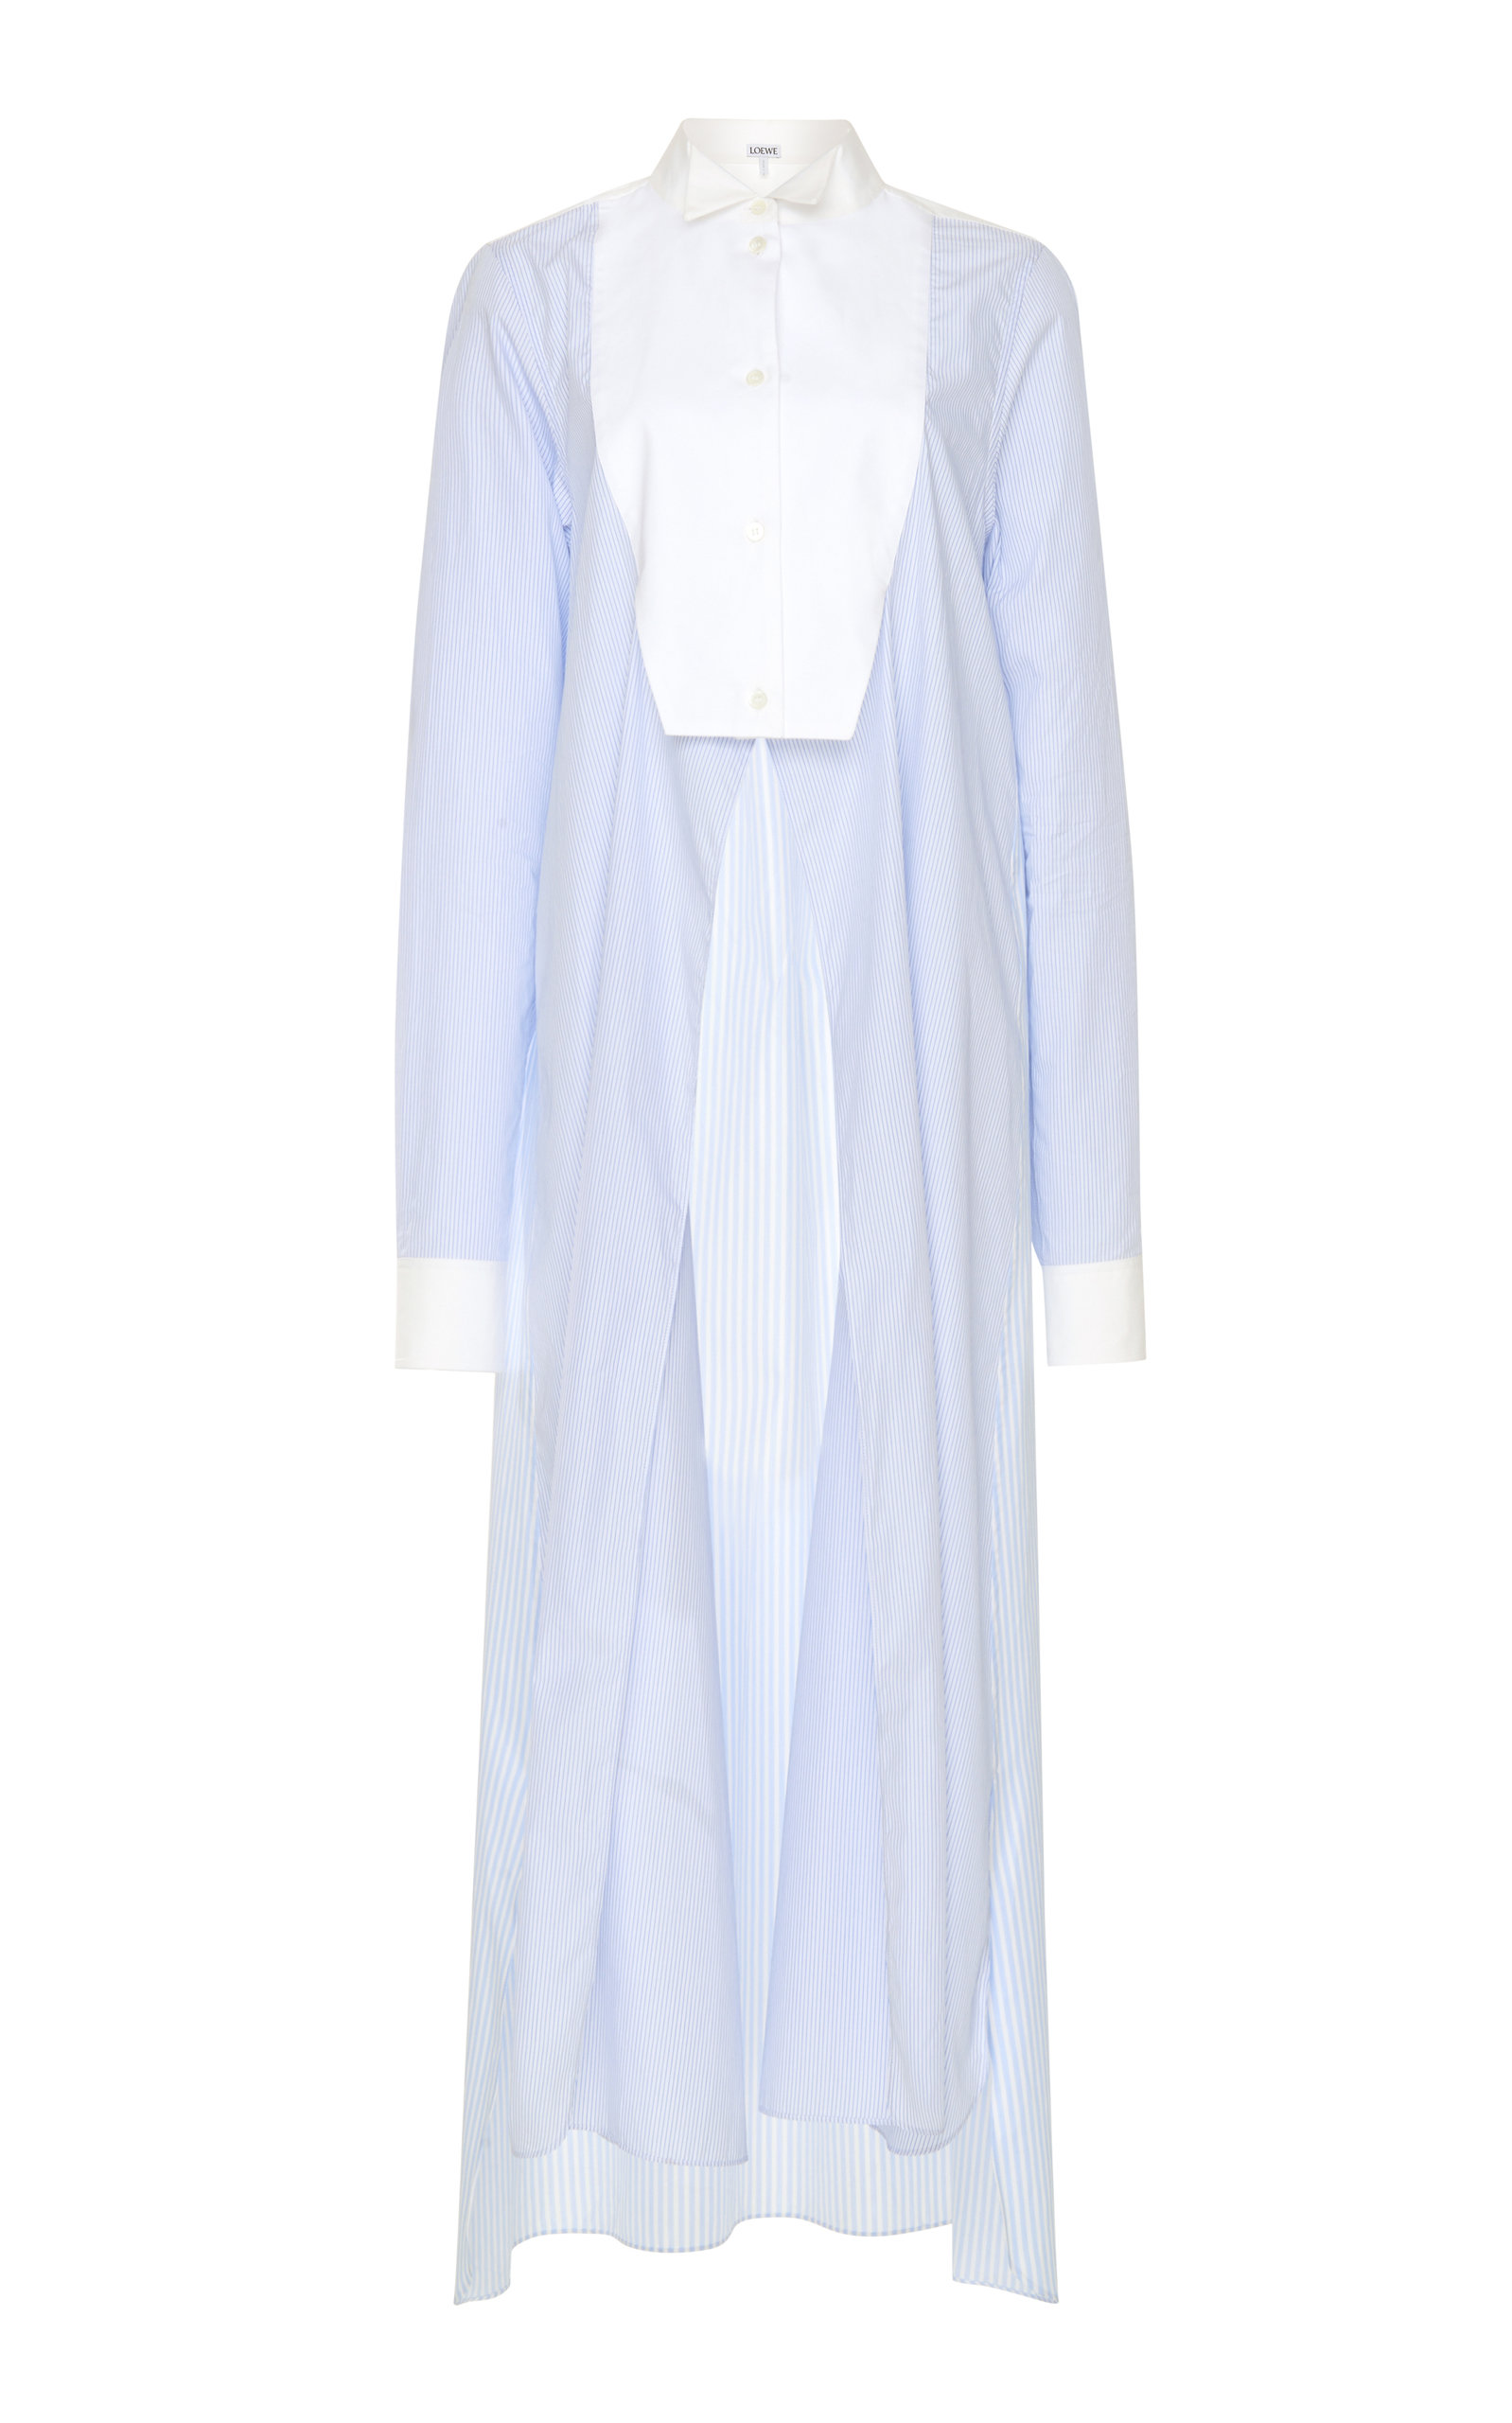 Loewe Dress Paneled Asymmetric Cotton-Poplin Shirt